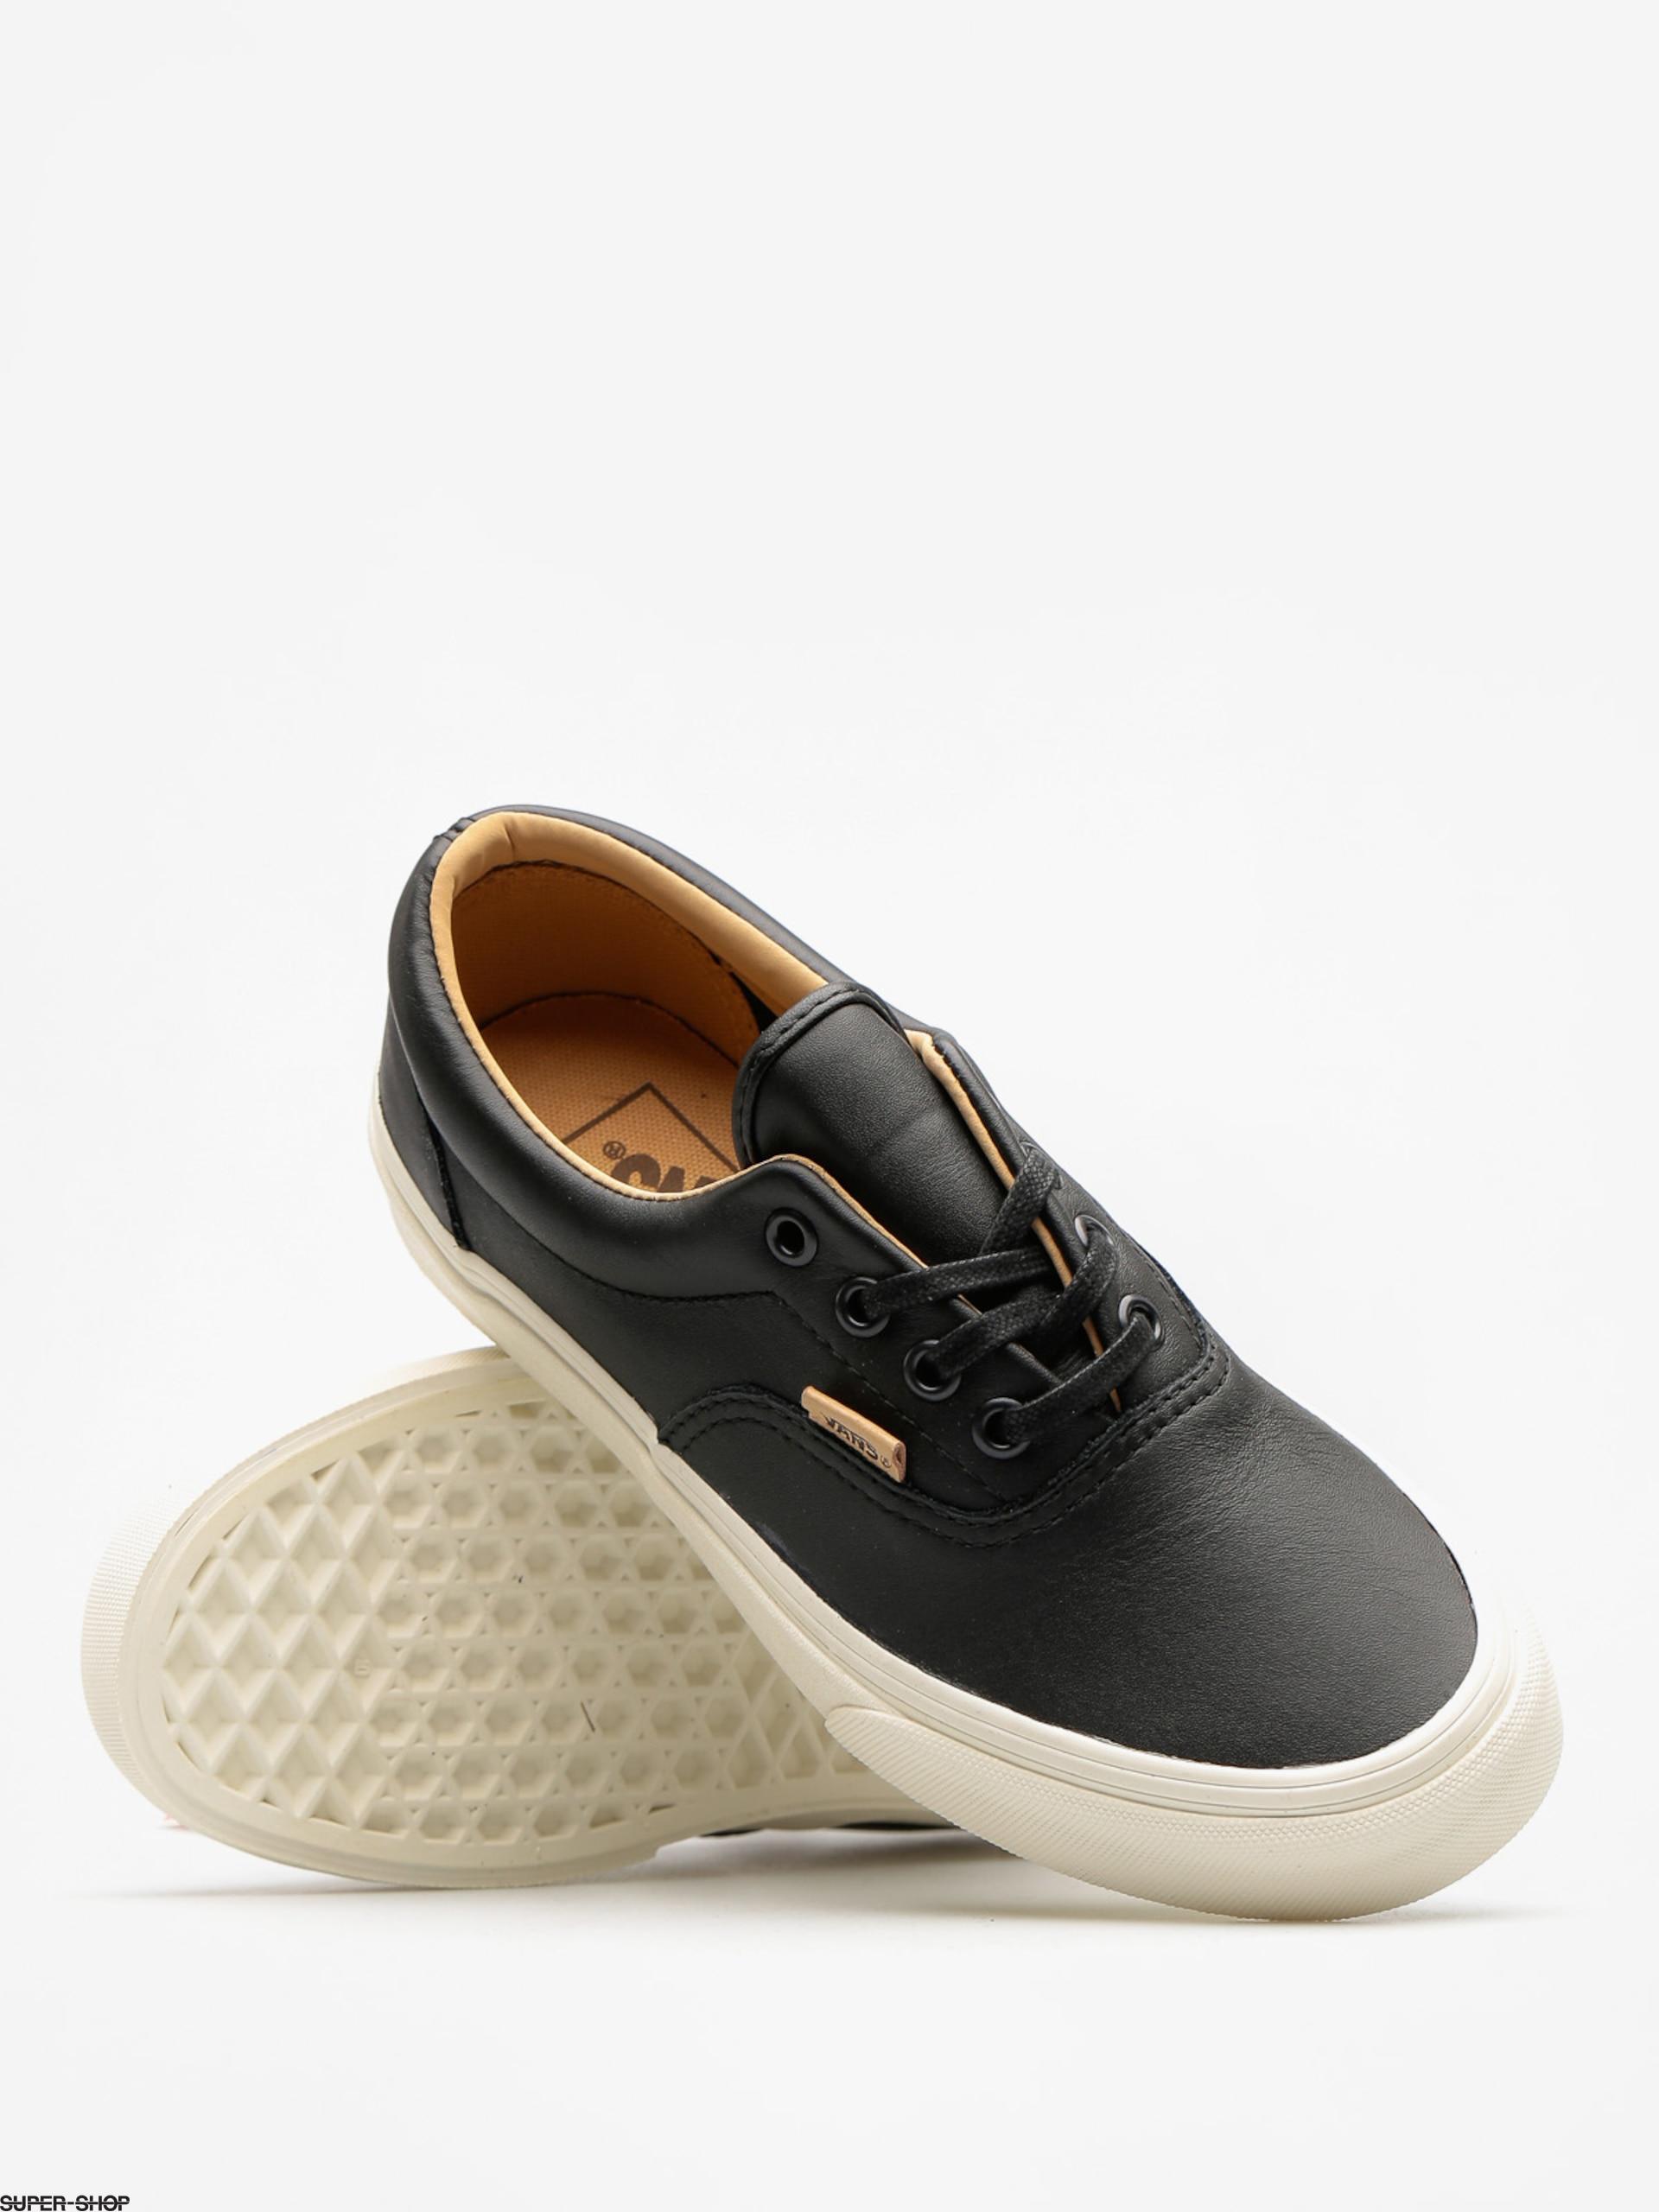 VANS Era In Lux Leather BlackPorcini